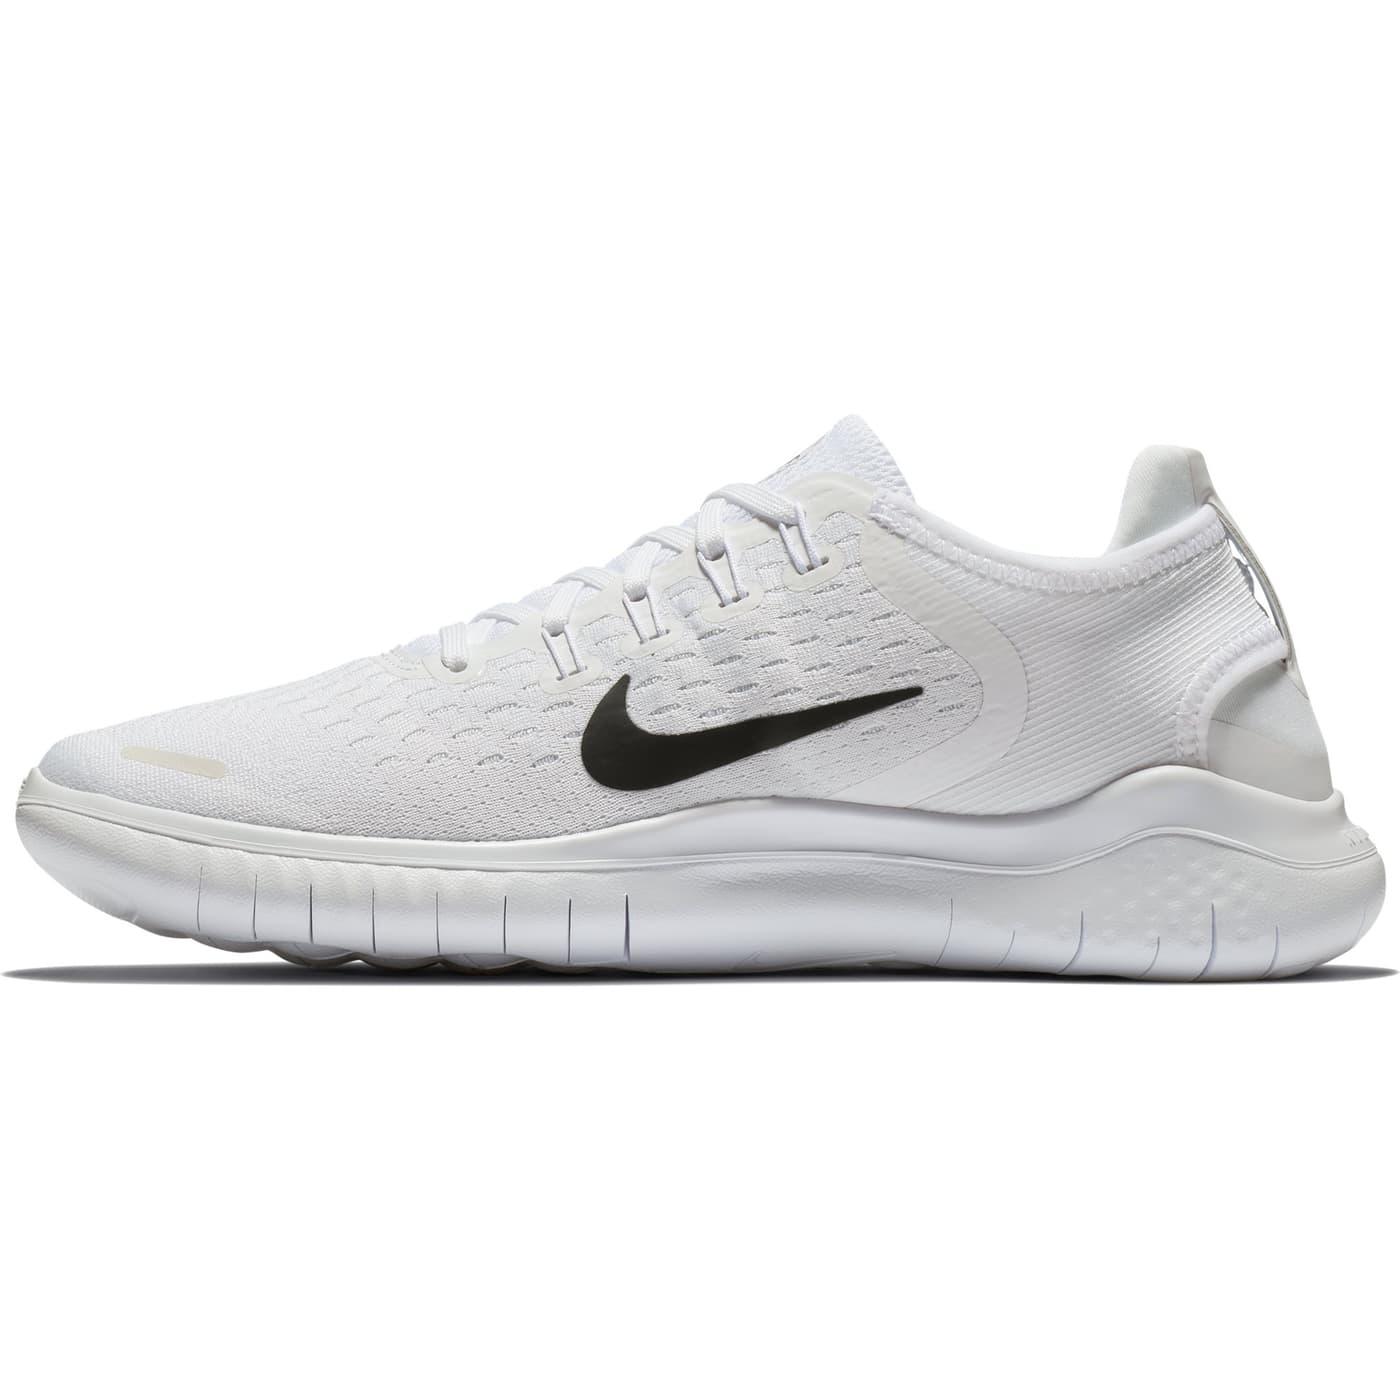 Run Free 2018 Loisirs De Pour Chaussures Femme Nike WDEI9YH2